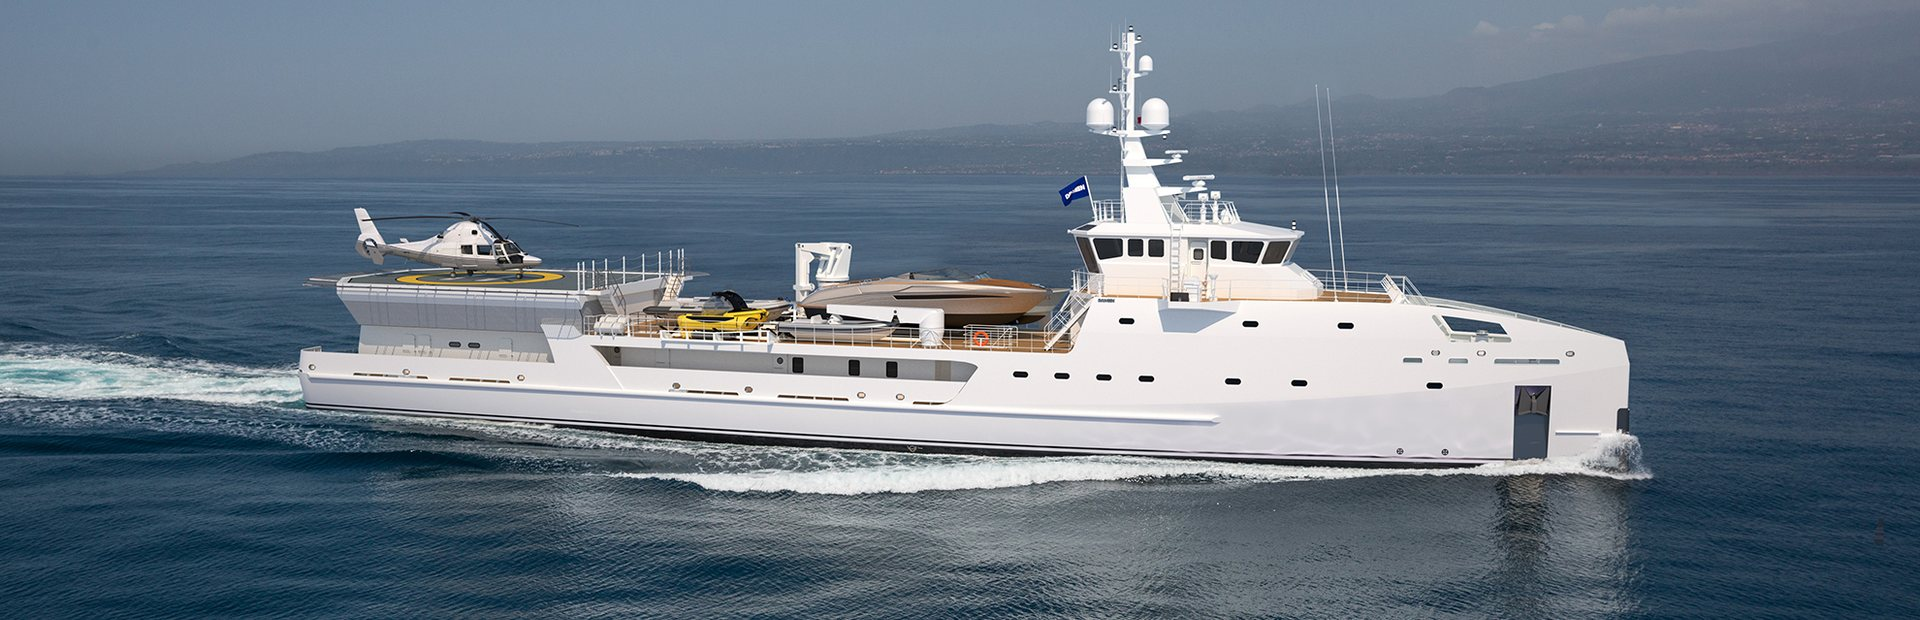 YS 6911 Yacht Charter